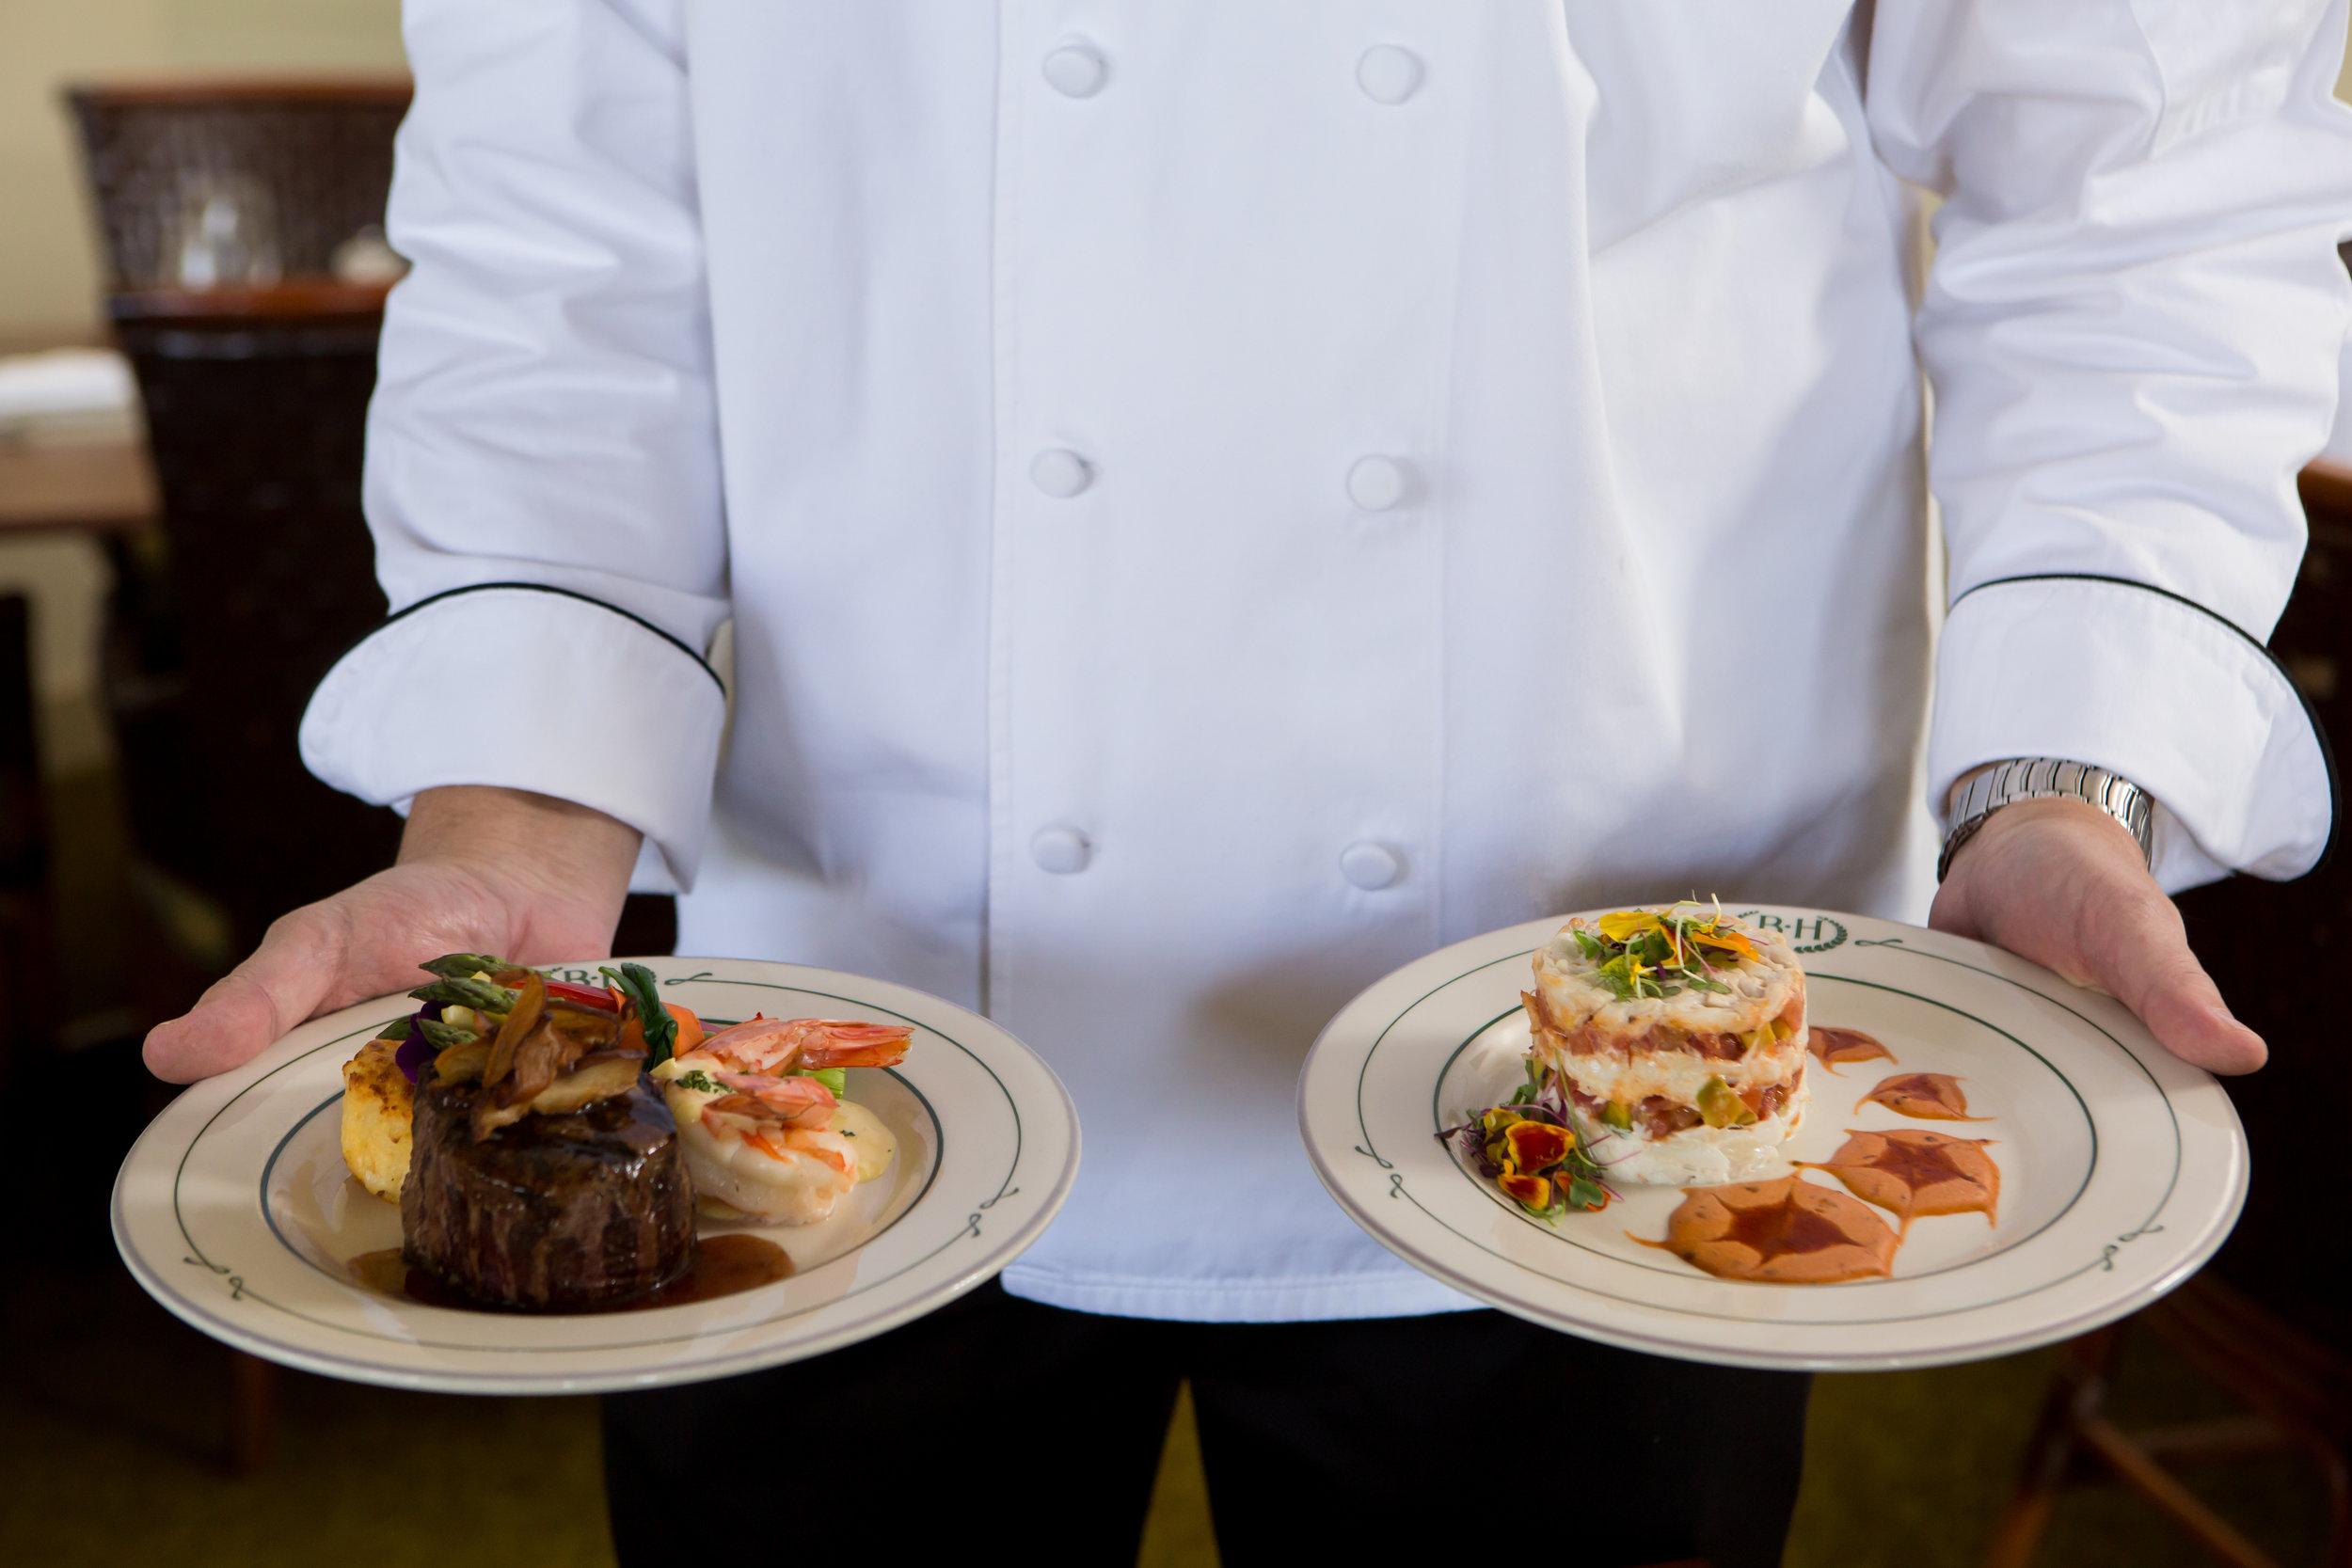 food-photography-chef-portrait-golf-dynamite-studio-serving-food.jpg